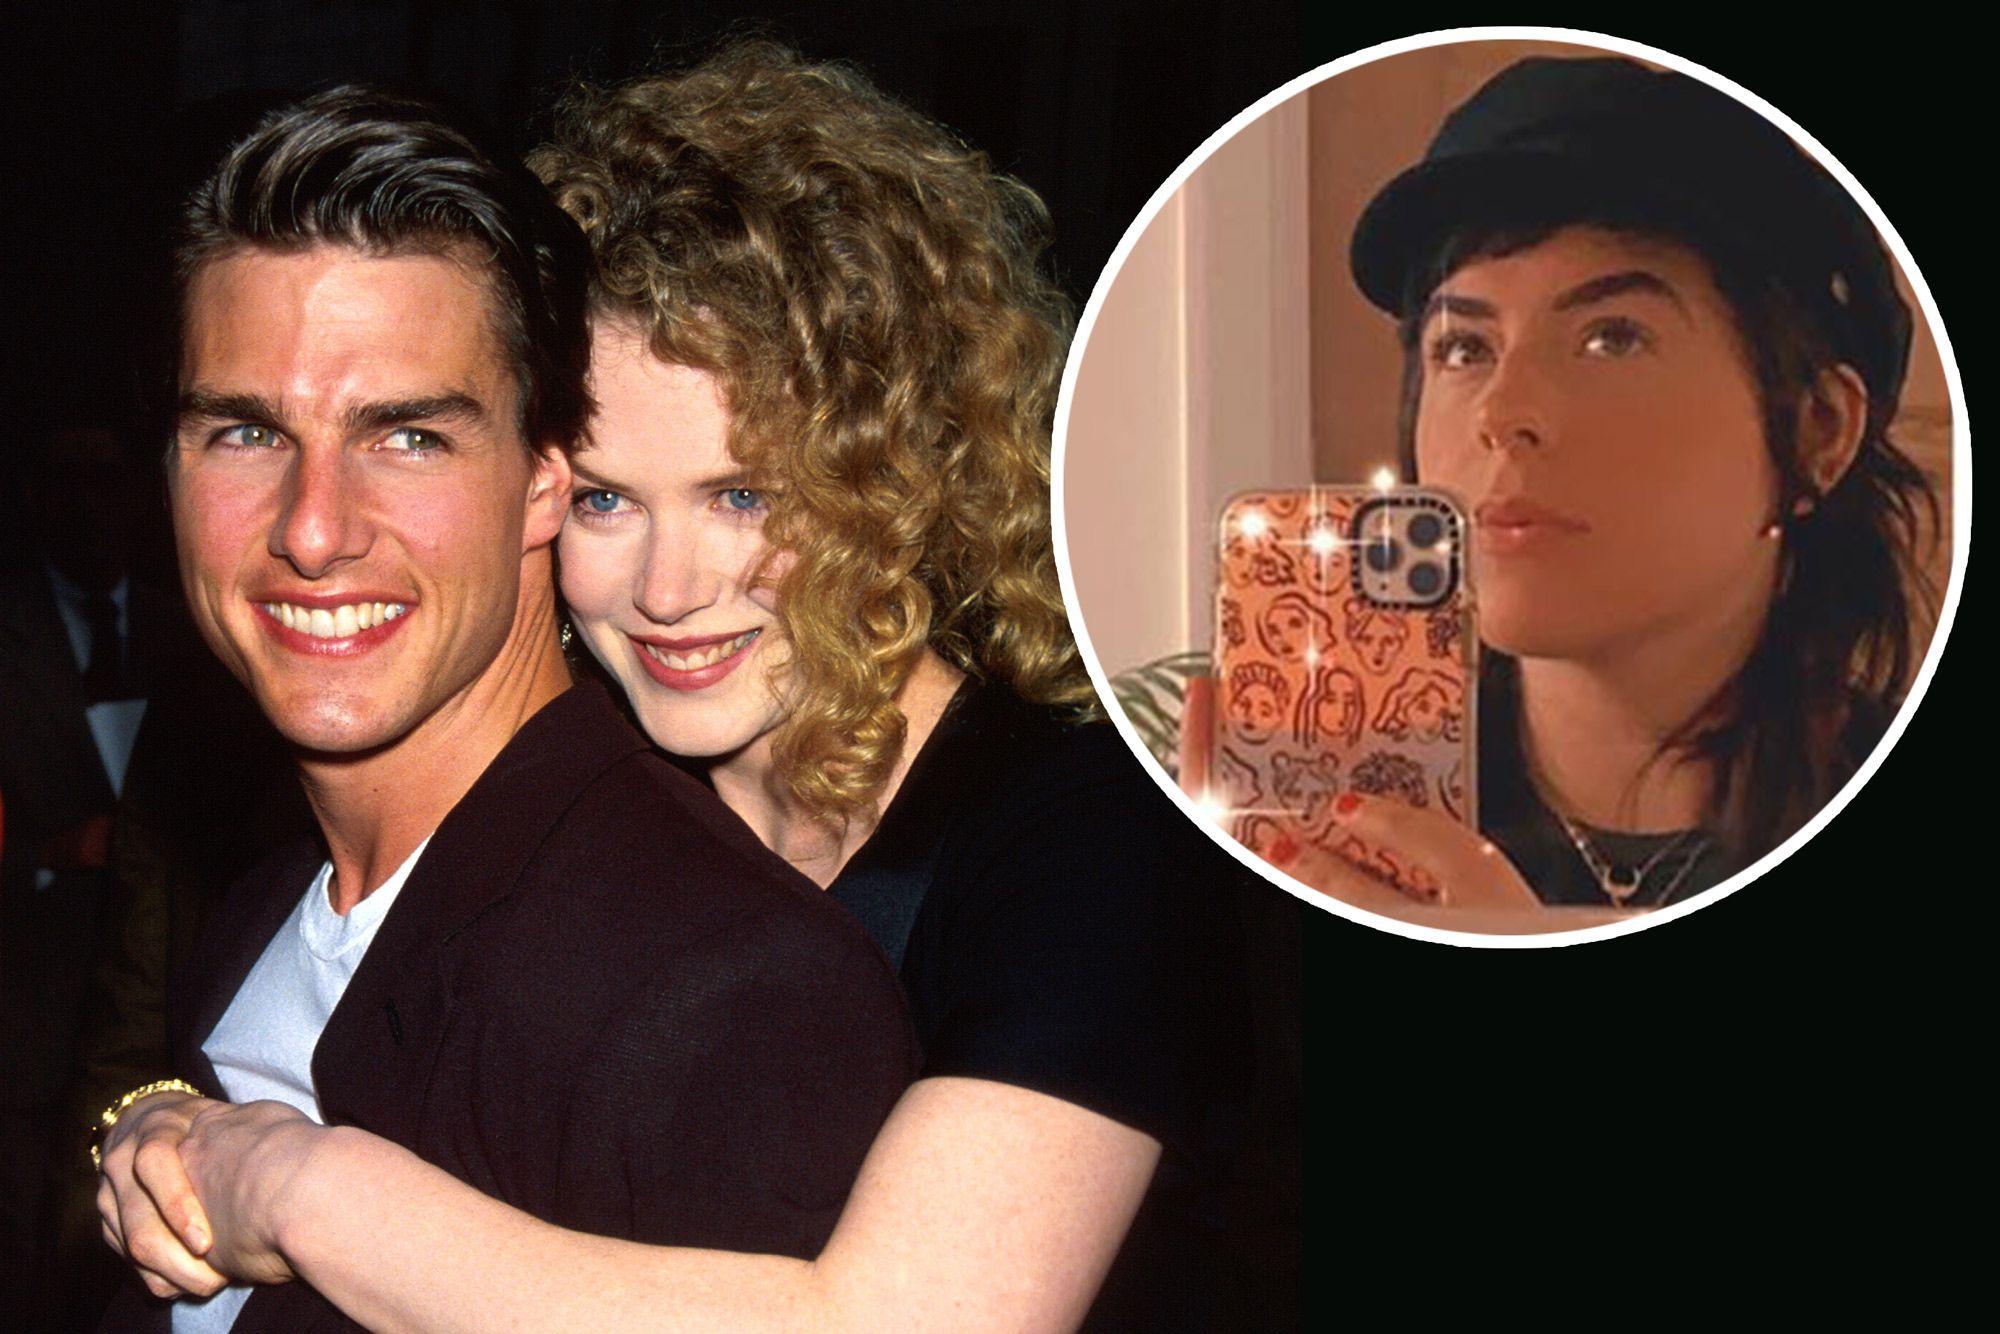 Tom Cruise and Nicole Kidman's Daughter Bella